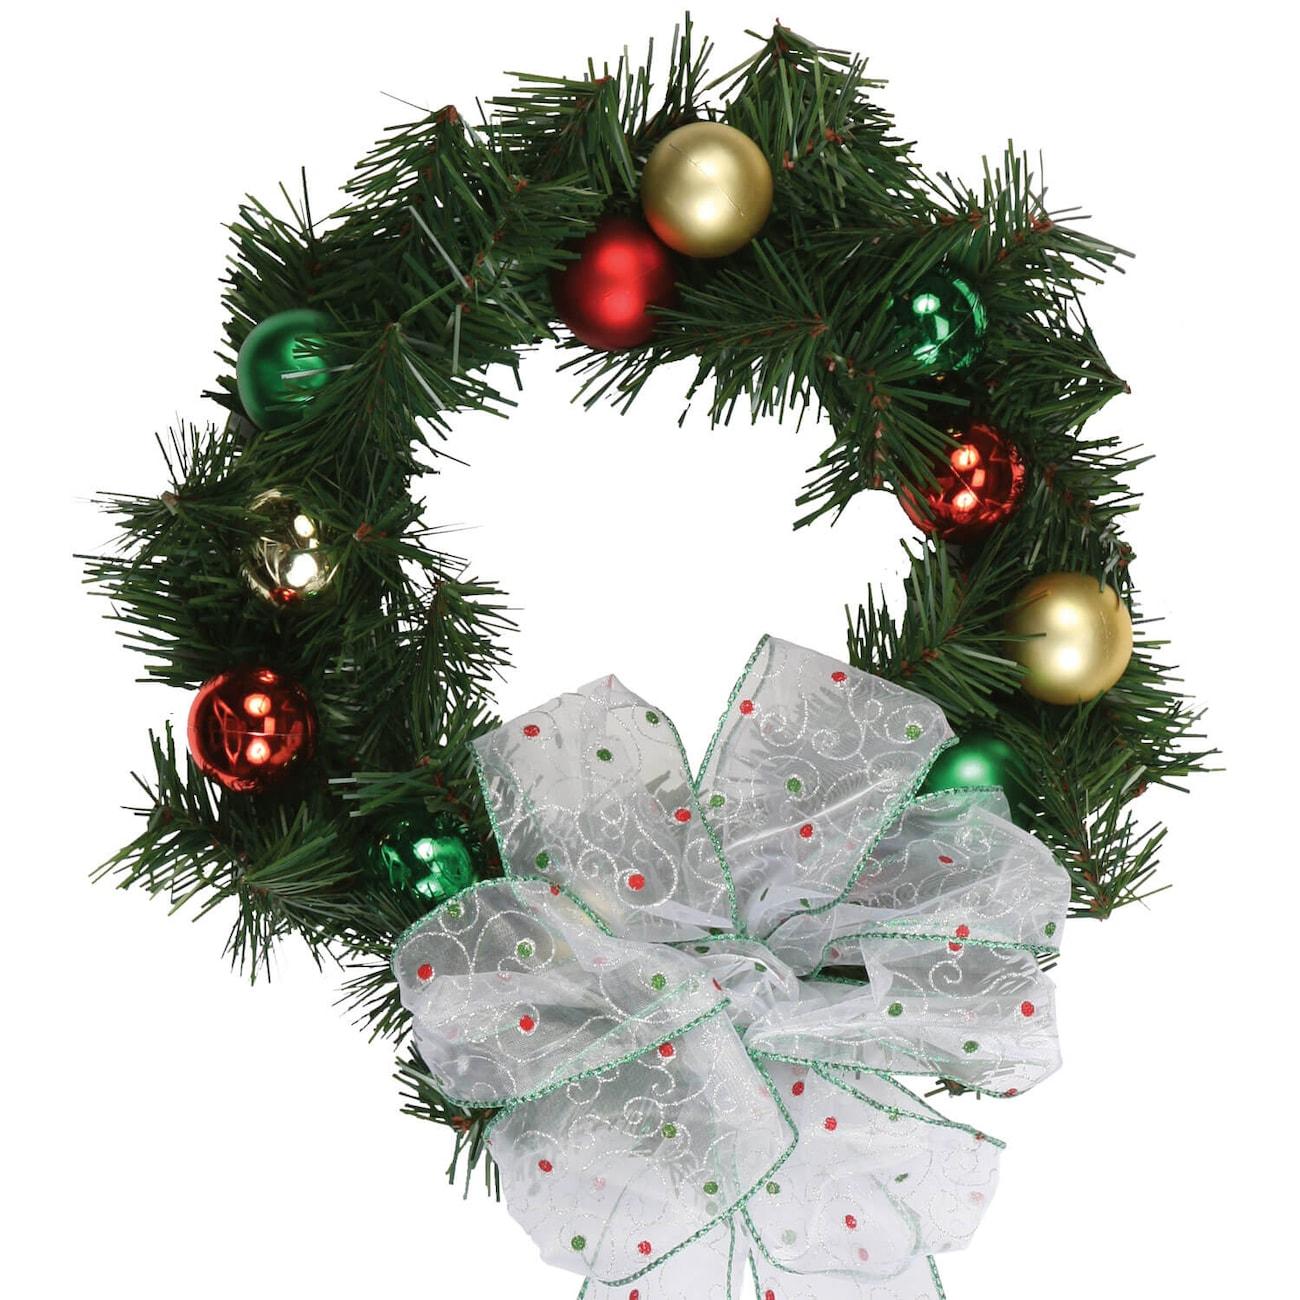 Ornament Ideas - Dollar Tree, Inc.